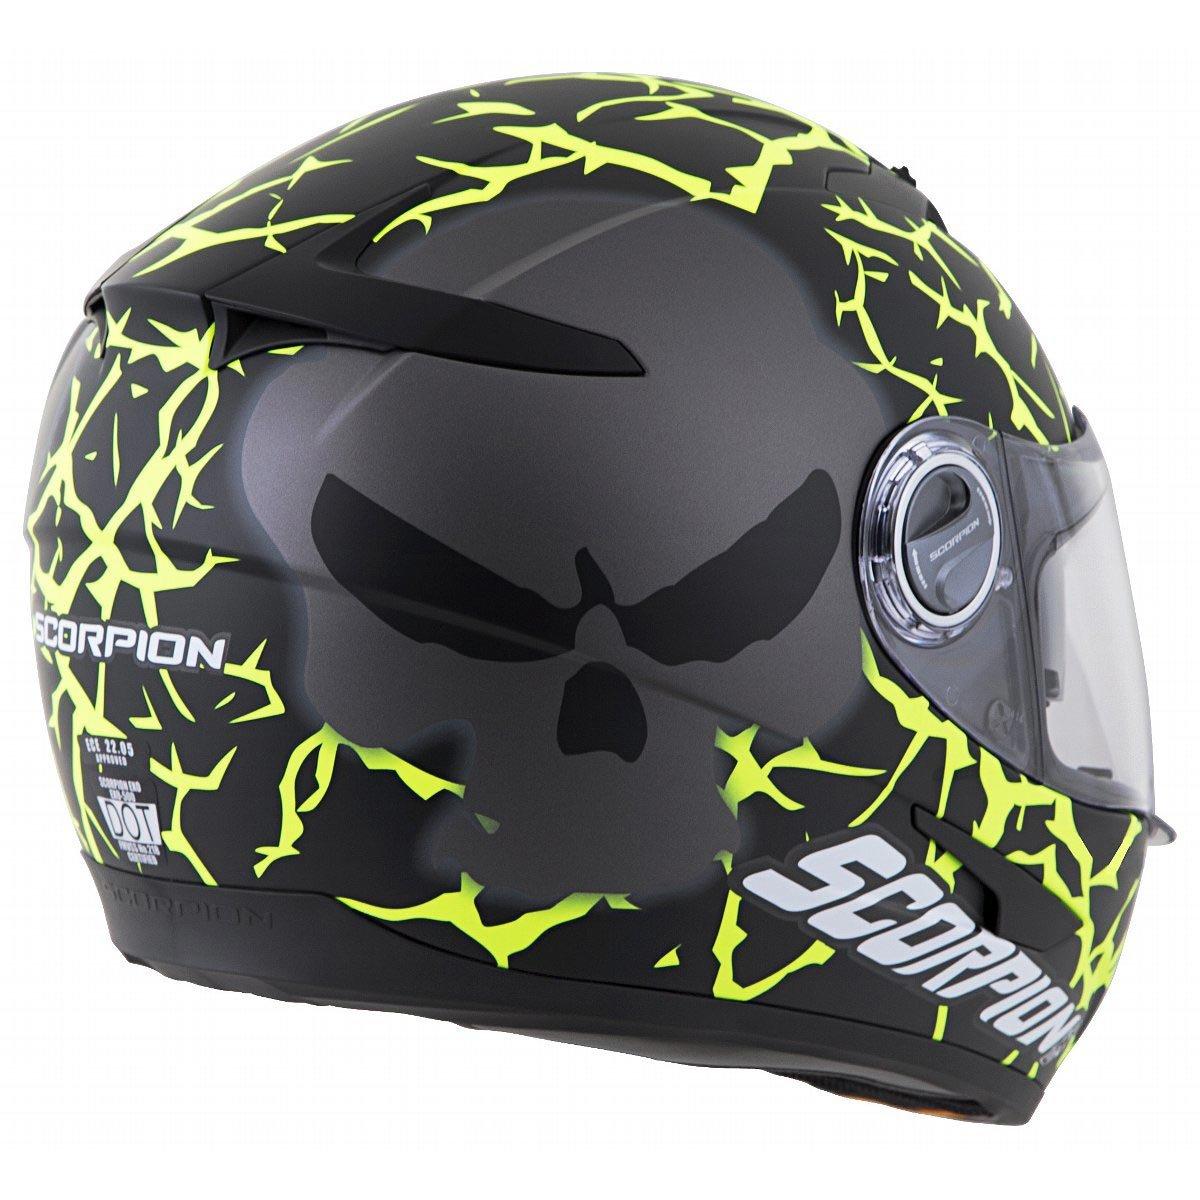 Amazon.com: Scorpion exo-500 numbskull Street Casco para ...